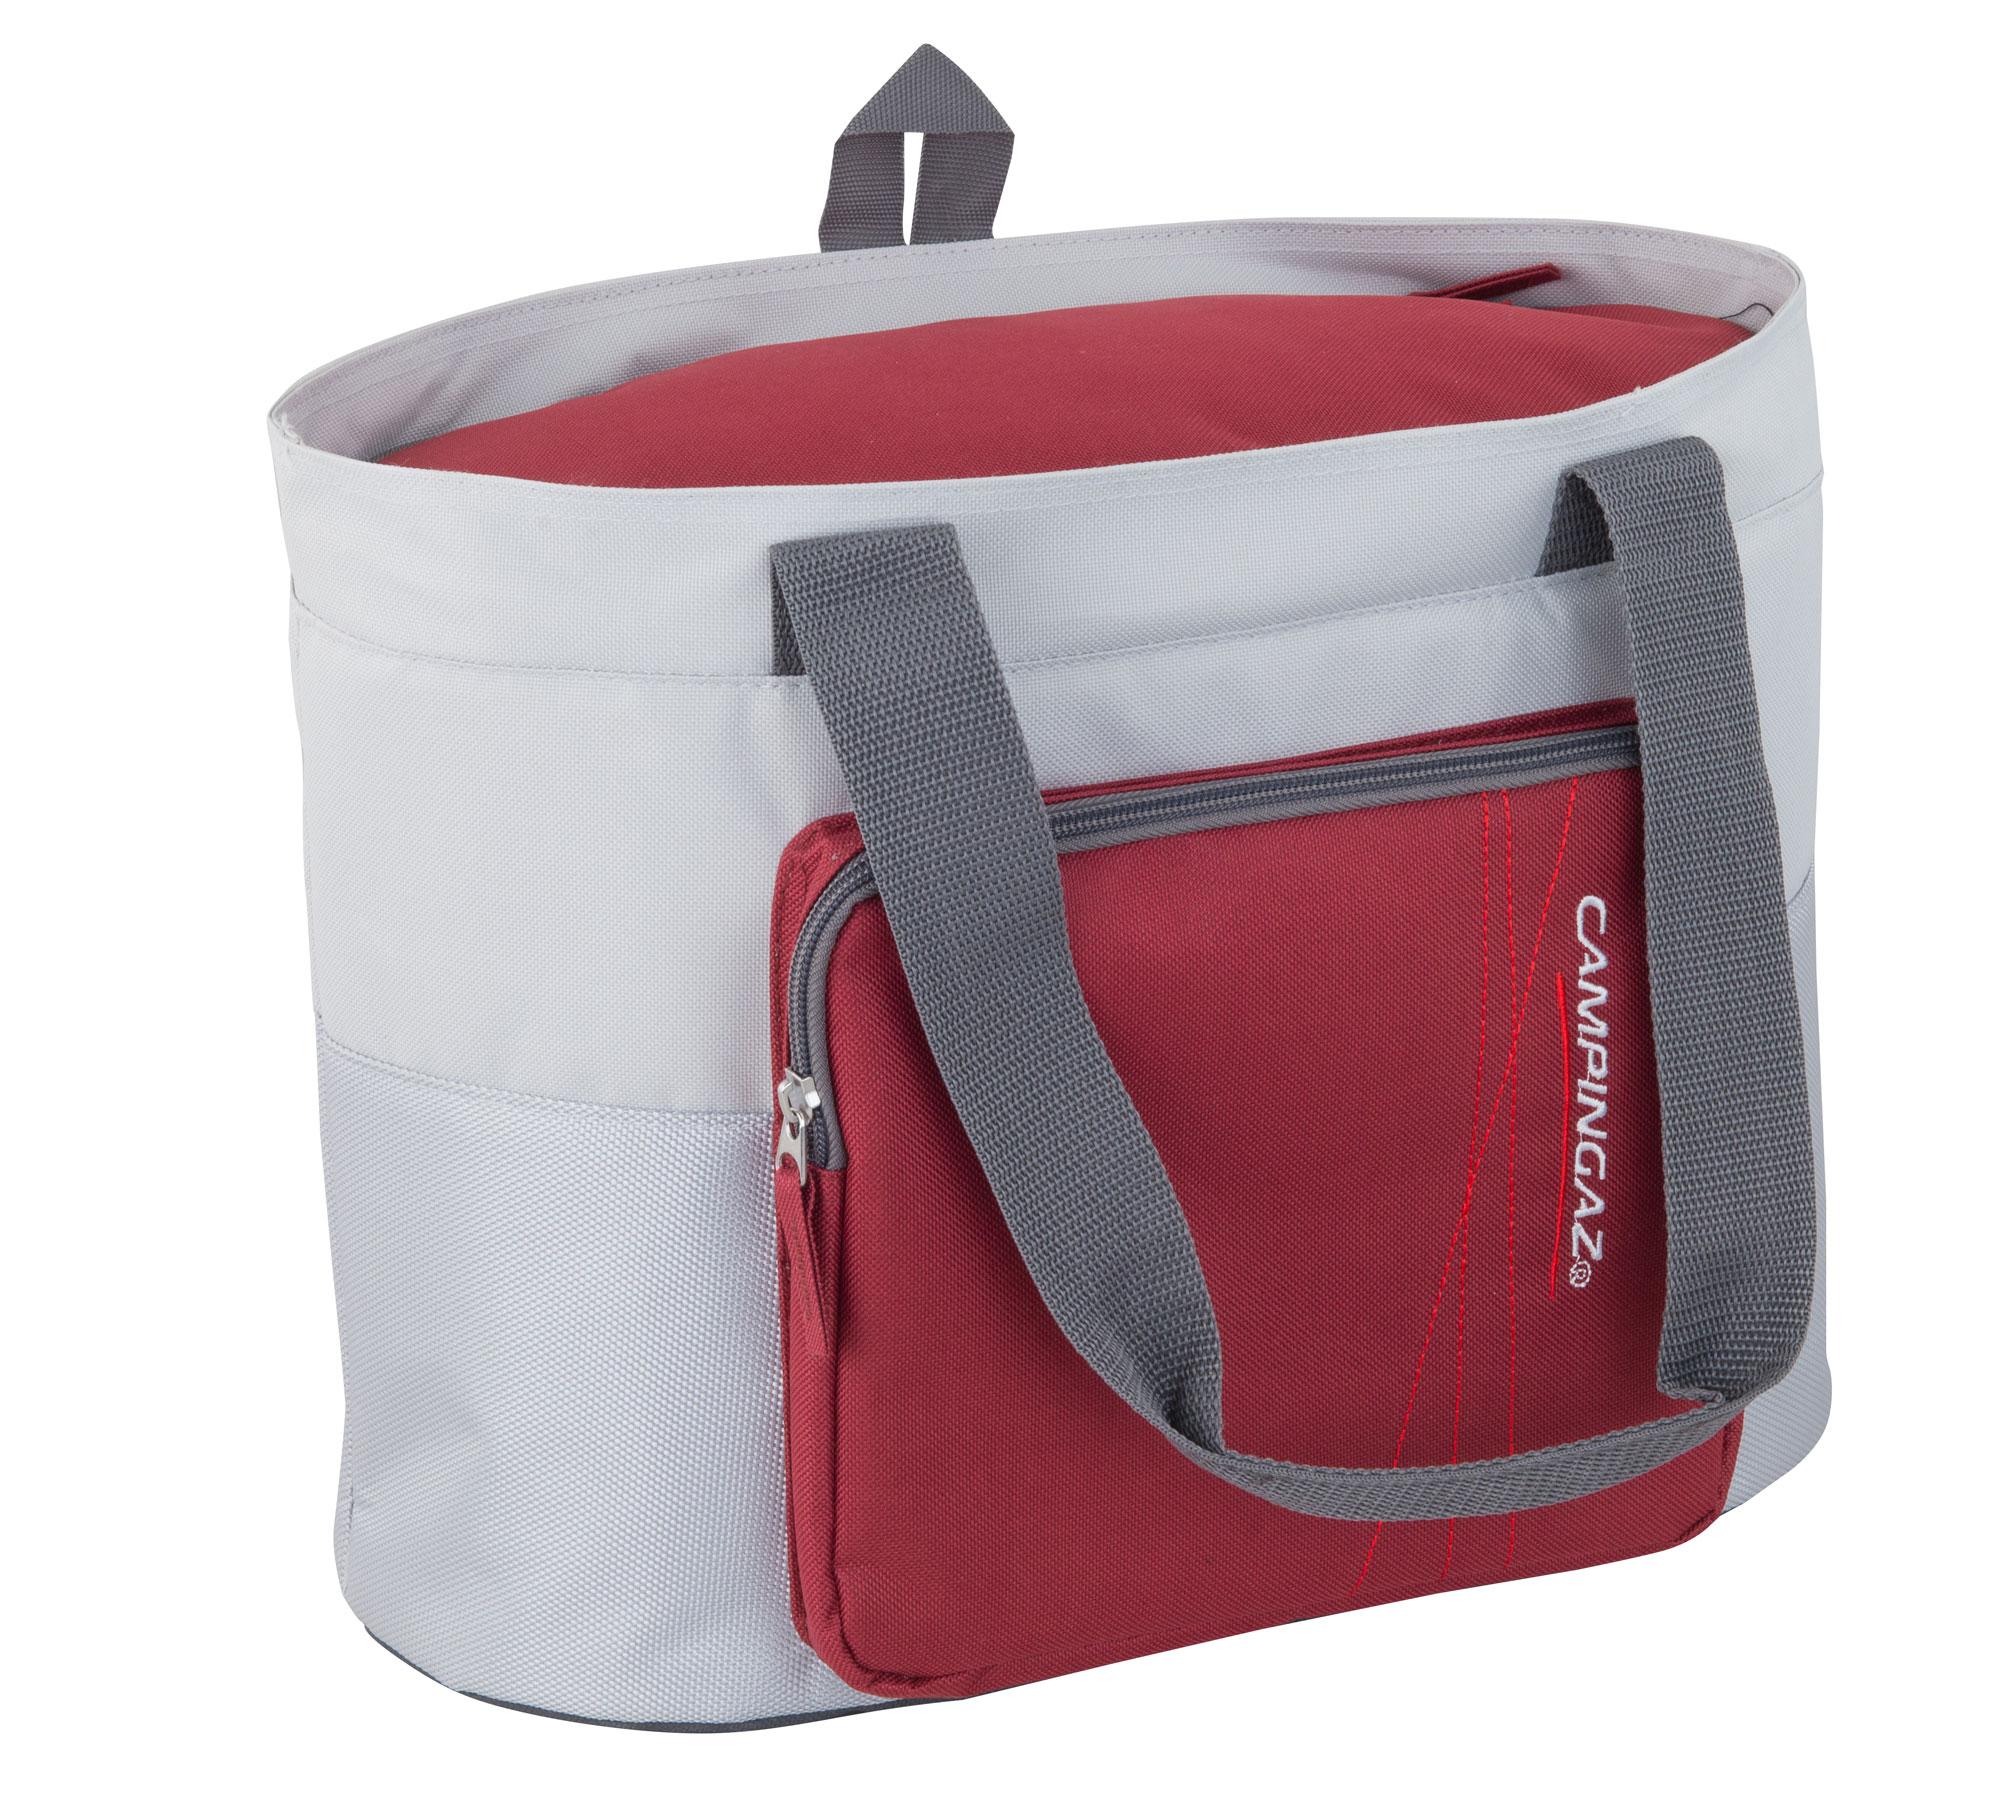 Campingaz Kühltasche Urban Picnic Bag 18 Liter Bild 1